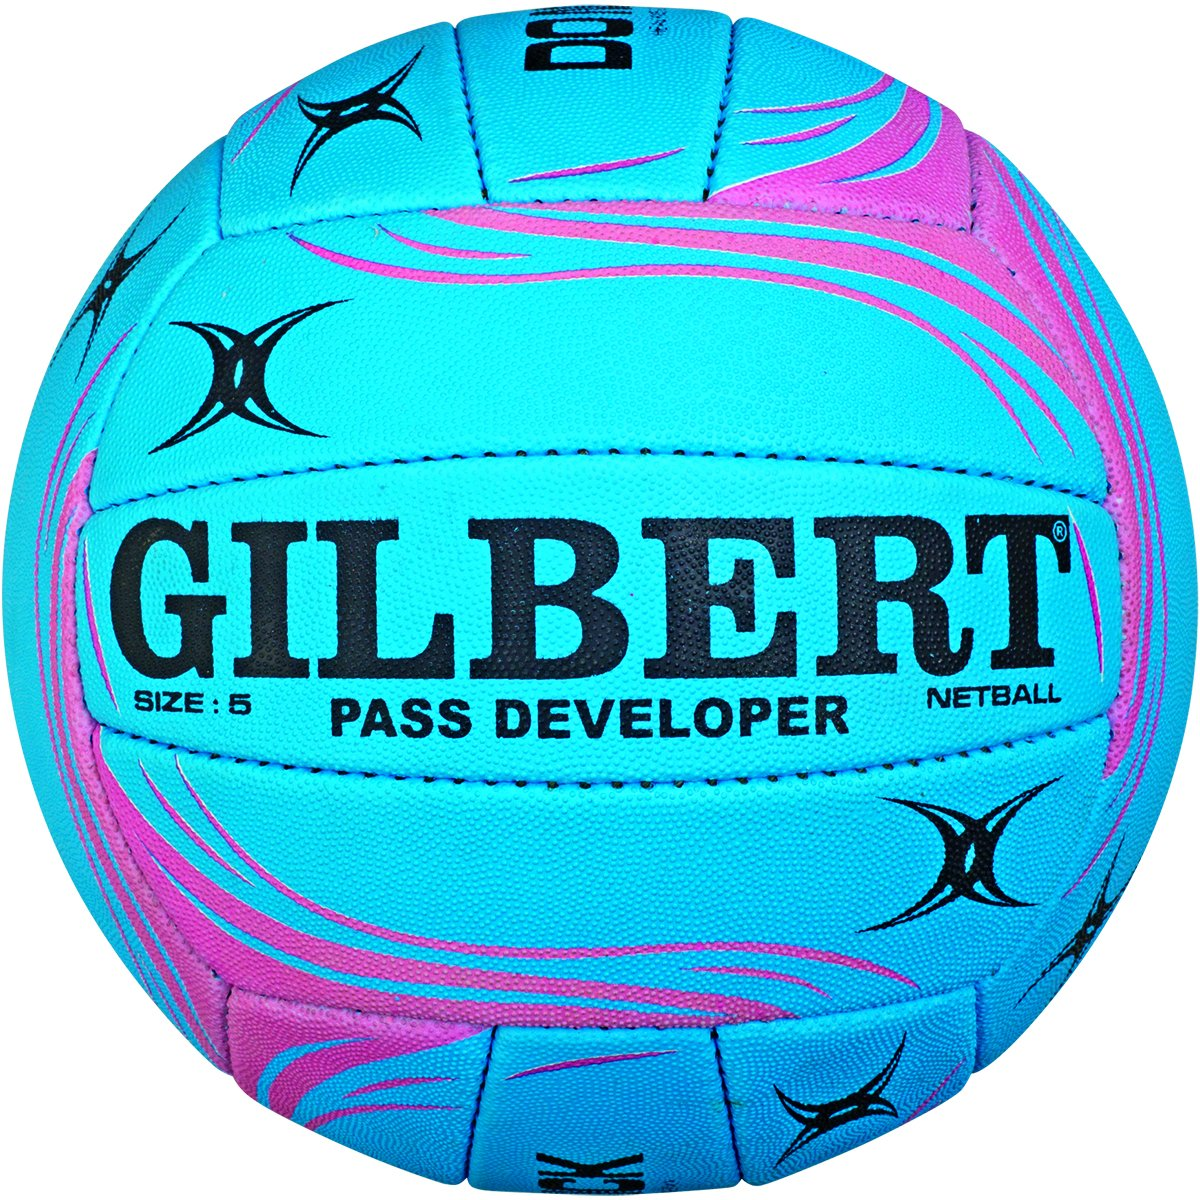 Gilbert Ballon Entraî nement de Netball Dé veloppeur de Passe - Bleu/Rose Taille 5 Grays 86883705